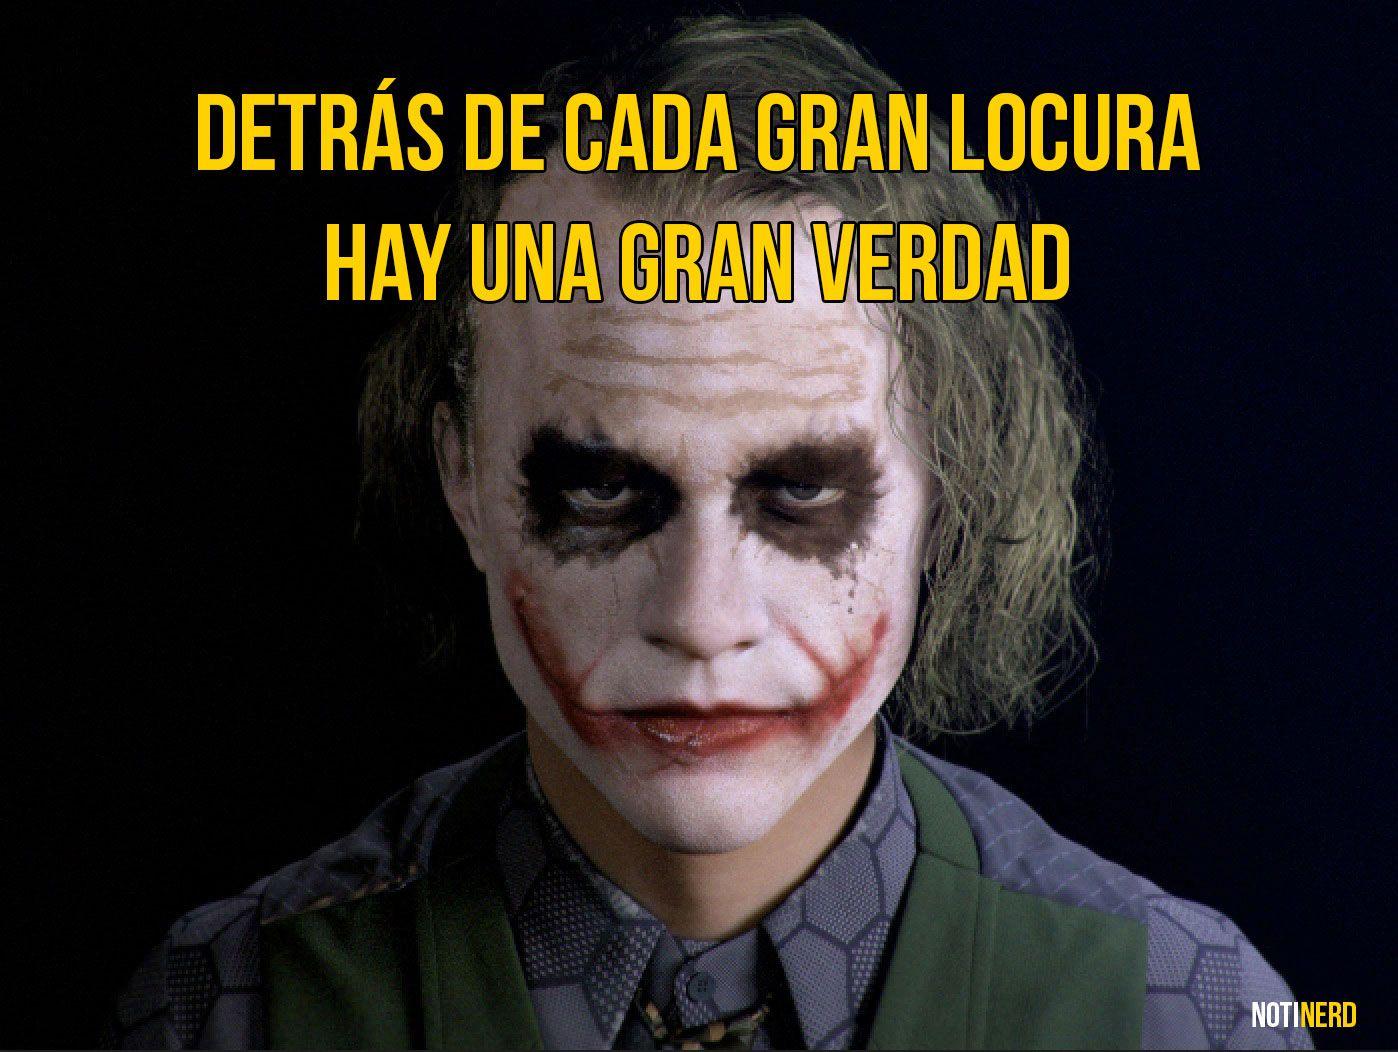 Galeria 13 Frases Cruelmente Verdaderas Y Reflexivas De The Joker